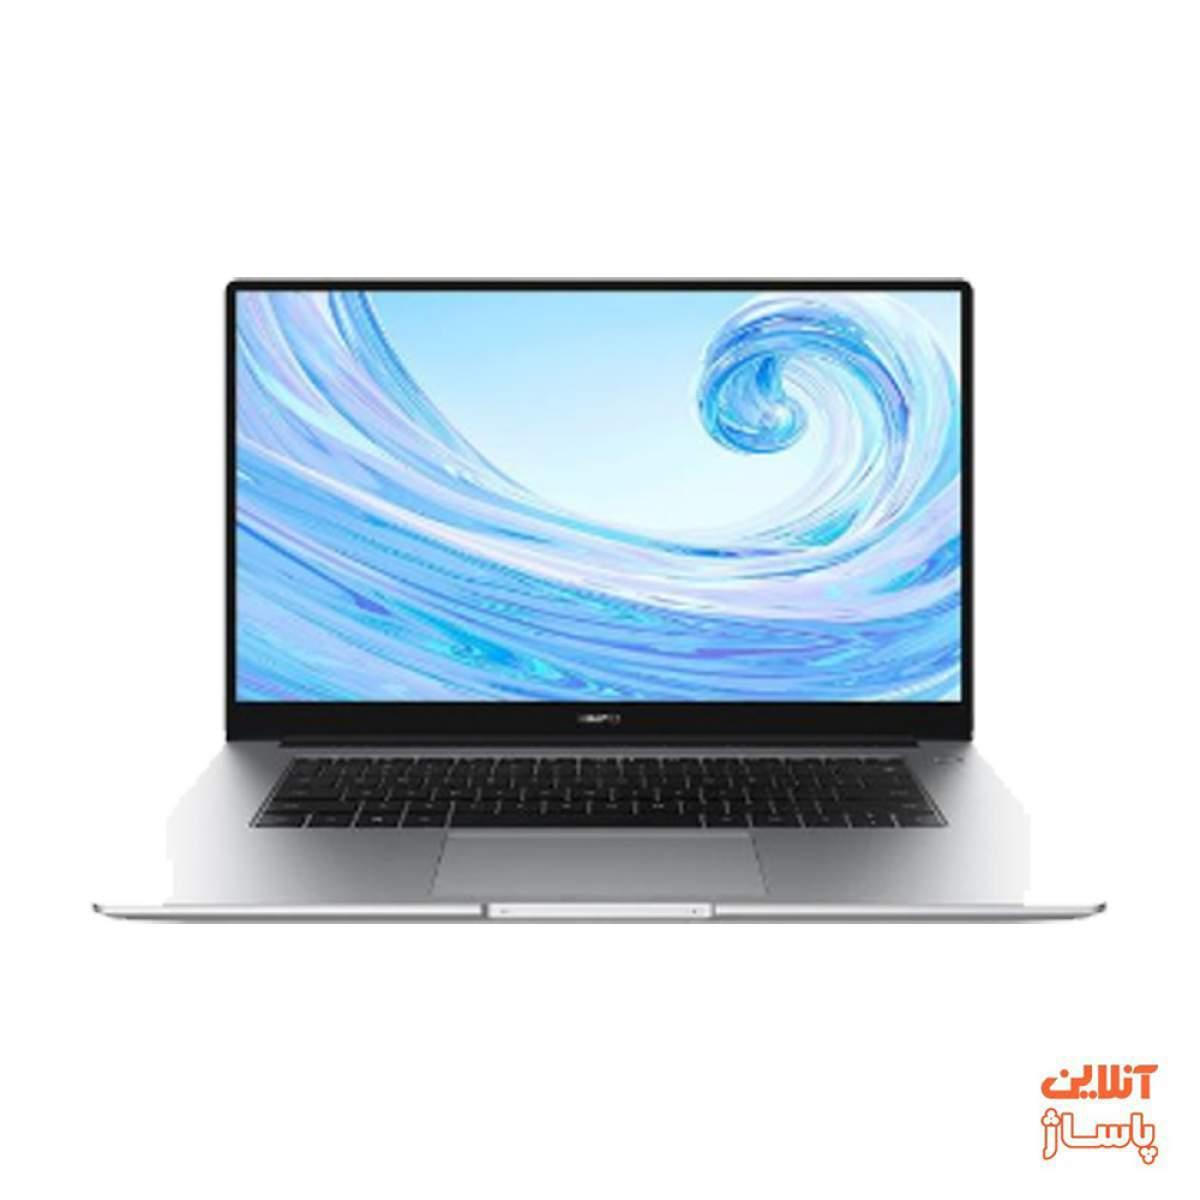 لپ تاپ 15 اینچی هوآوی مدل MateBook D 2020 AMD-A